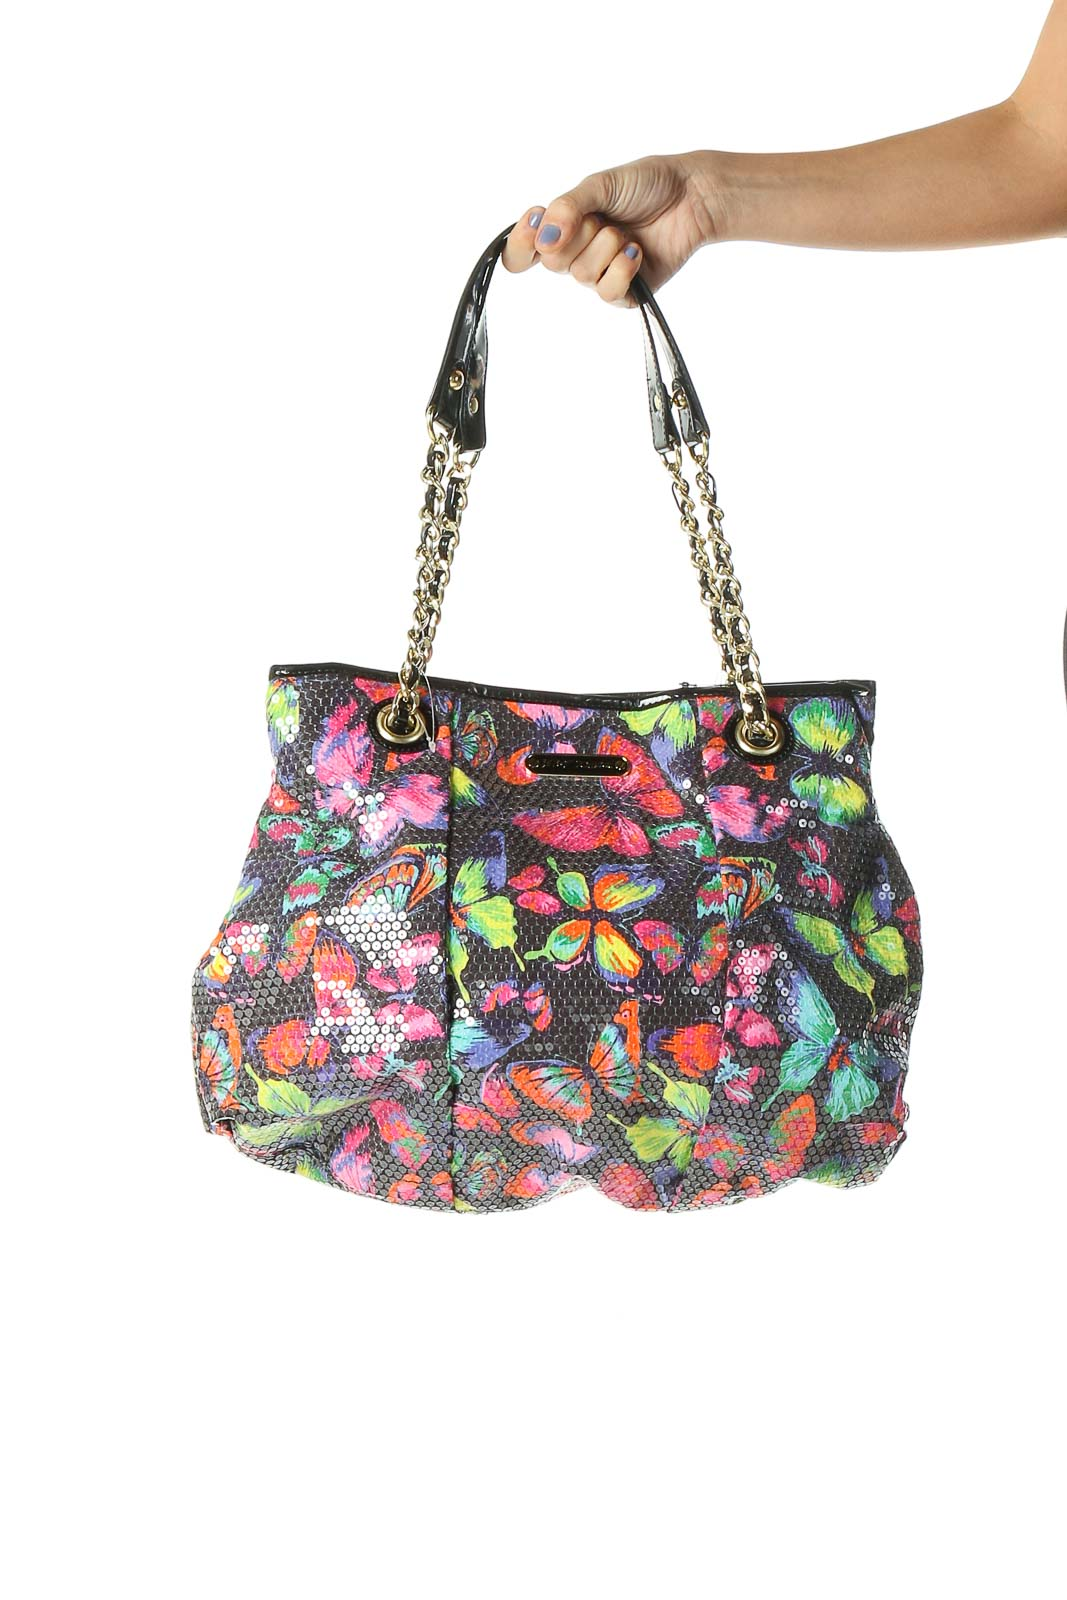 Multicolor Tote Bag Front